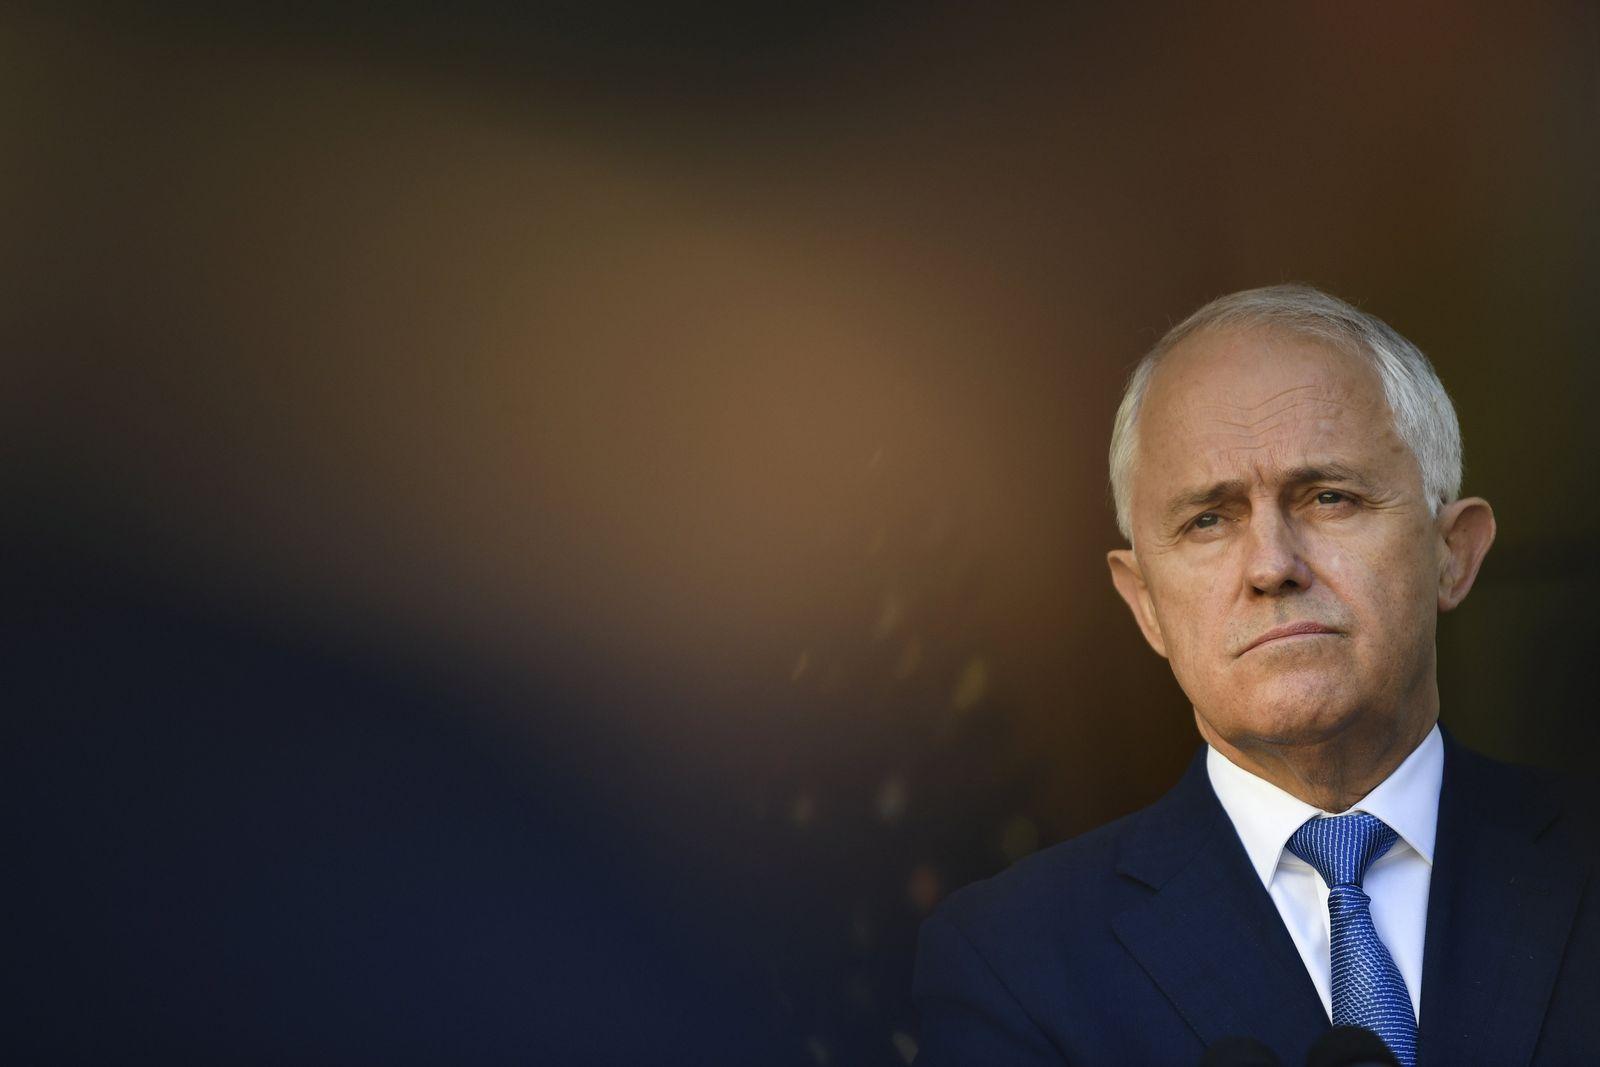 AUSTRALIA-BANKS/INQUIRY